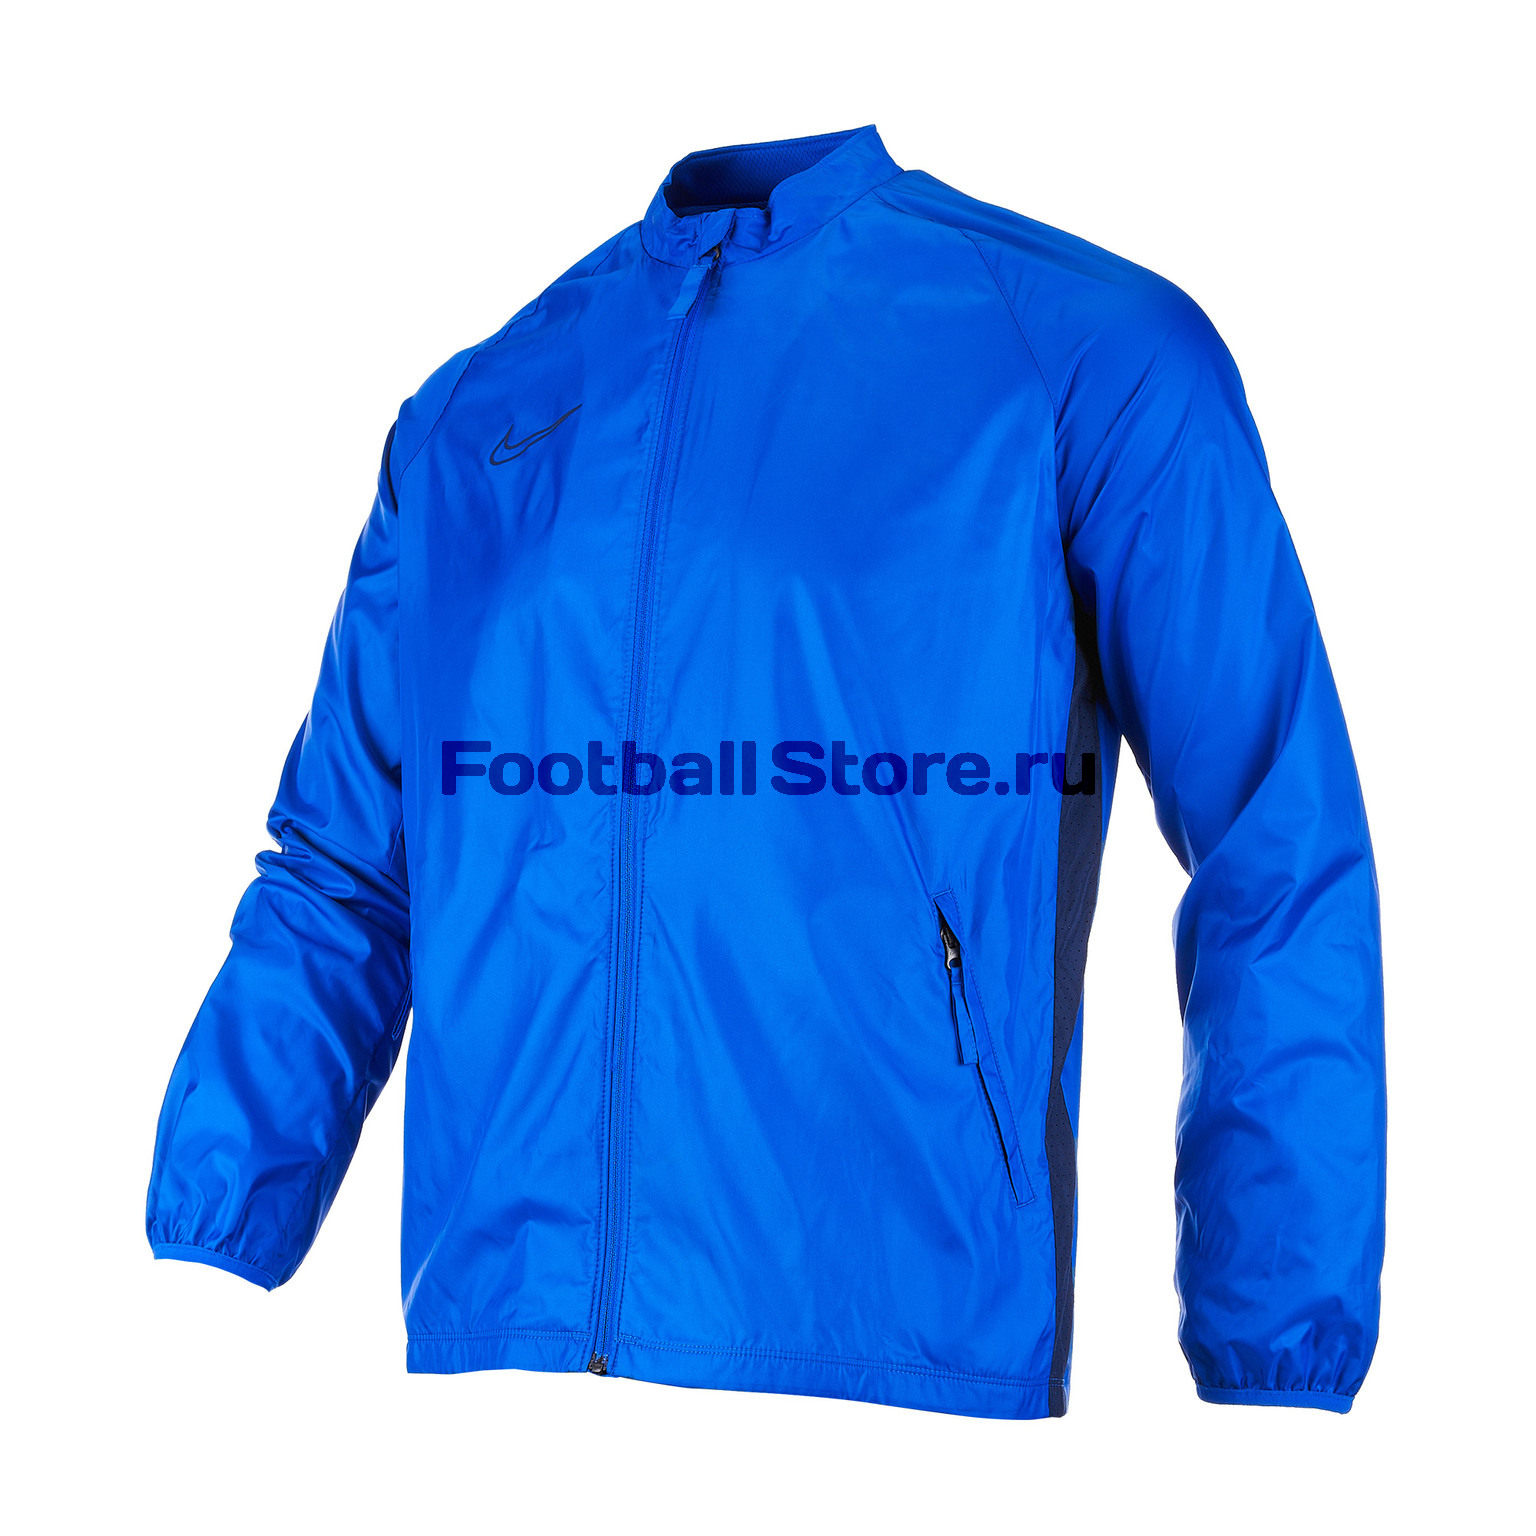 Куртка подростковая Nike Dry Academy AO0744-405 куртка для костюма nike academy 14 sdln knit jkt 588470 739